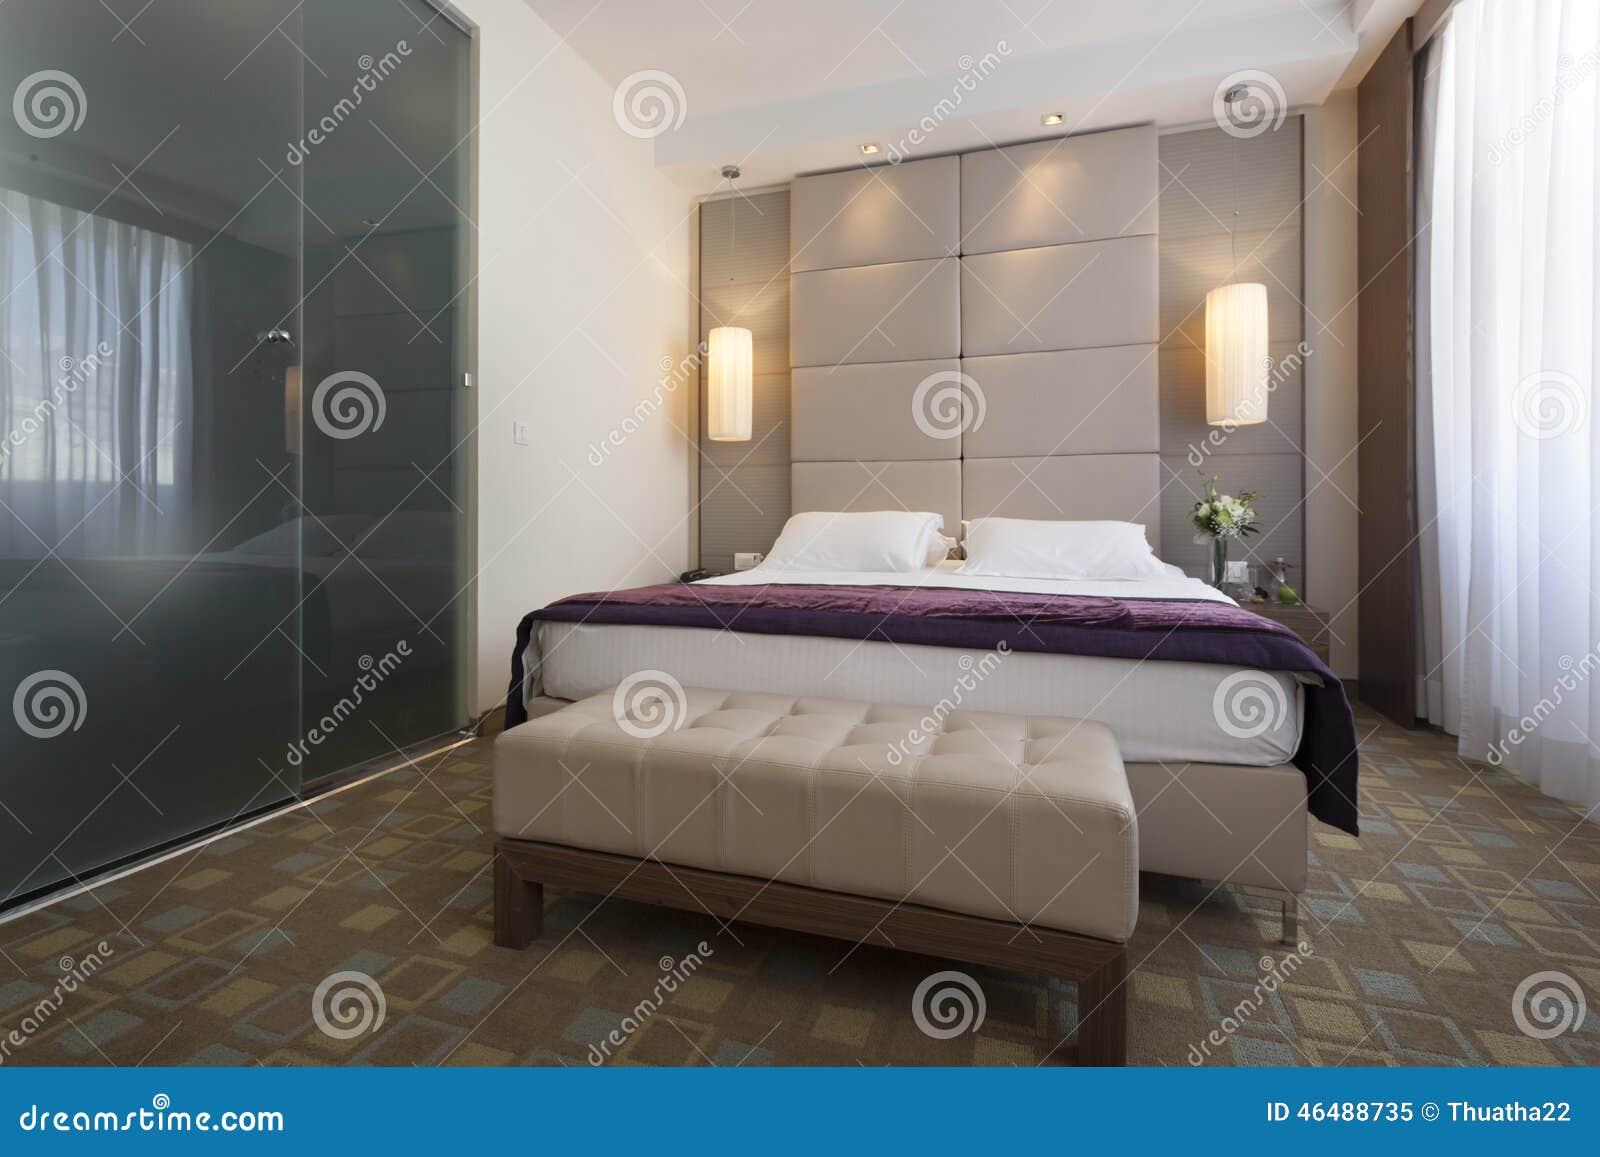 Interior of a luxury hotel bedroom with bathroom stock for Salle de bain hotel